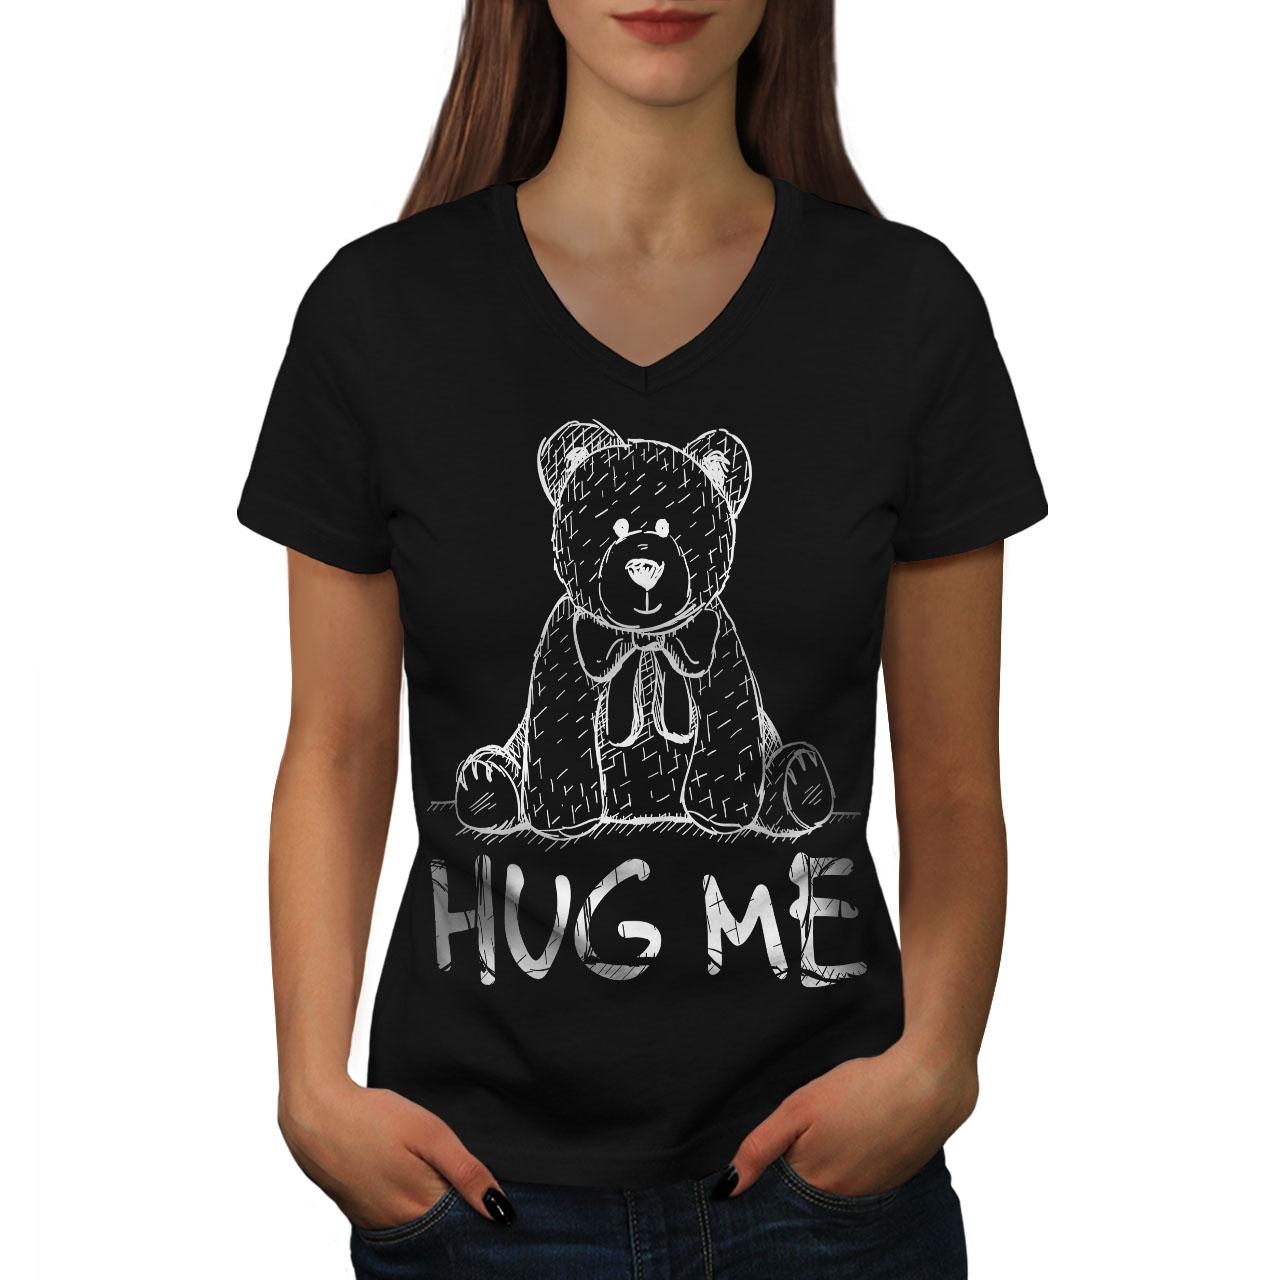 miniature 3 - Wellcoda Hug Me Teddy Bear Womens V-Neck T-shirt, Nice & Graphic Design Tee